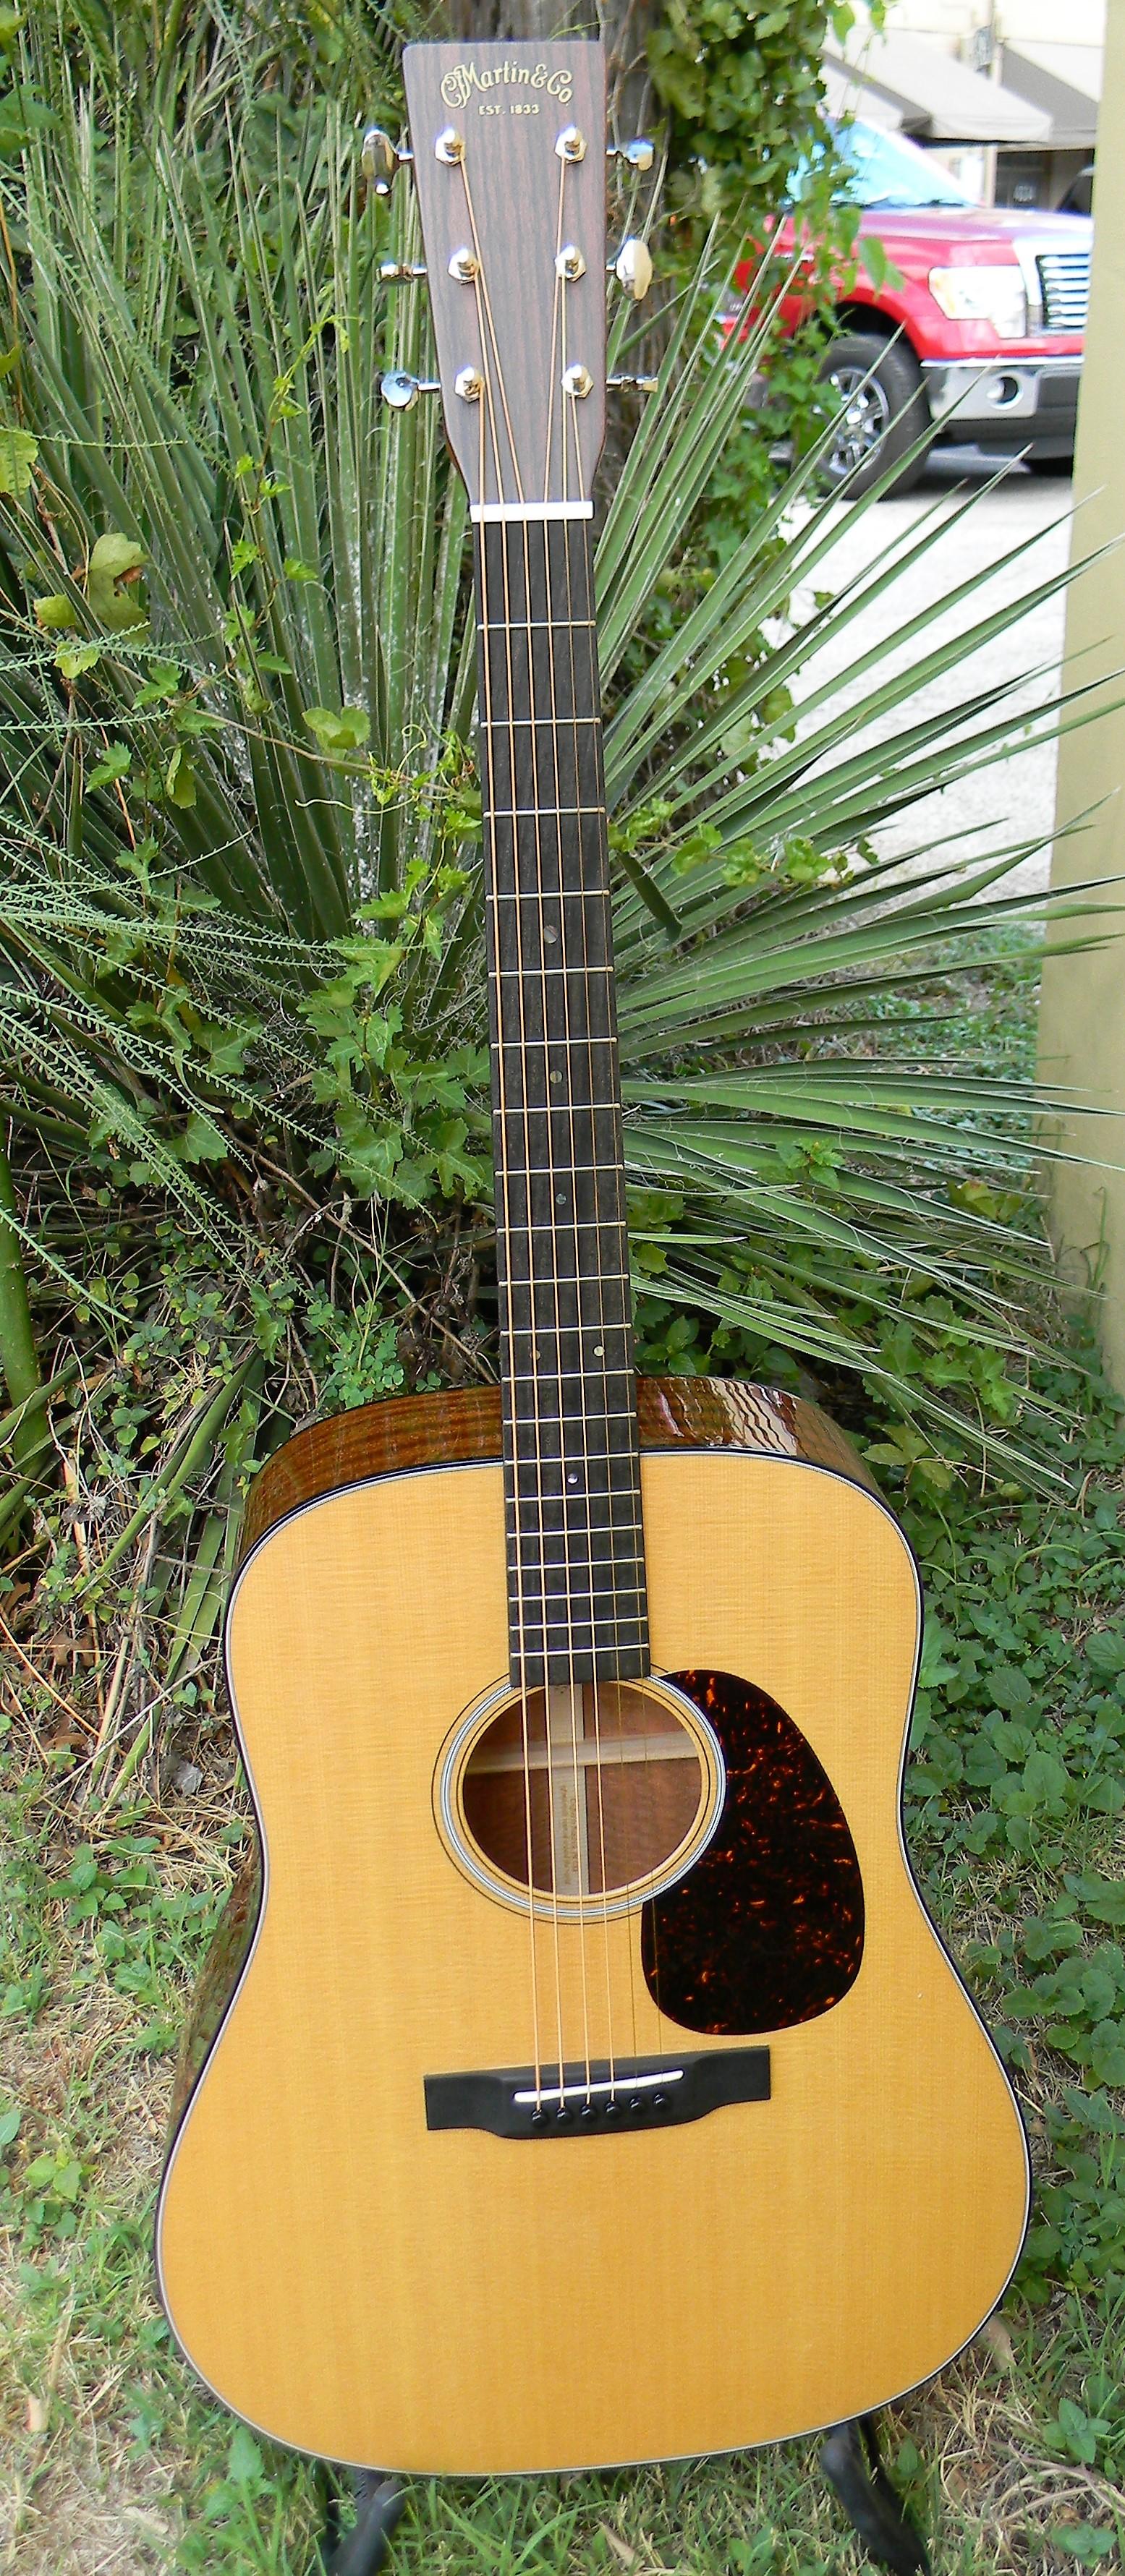 dscn1977 san antonio guitar store guitar tex. Black Bedroom Furniture Sets. Home Design Ideas